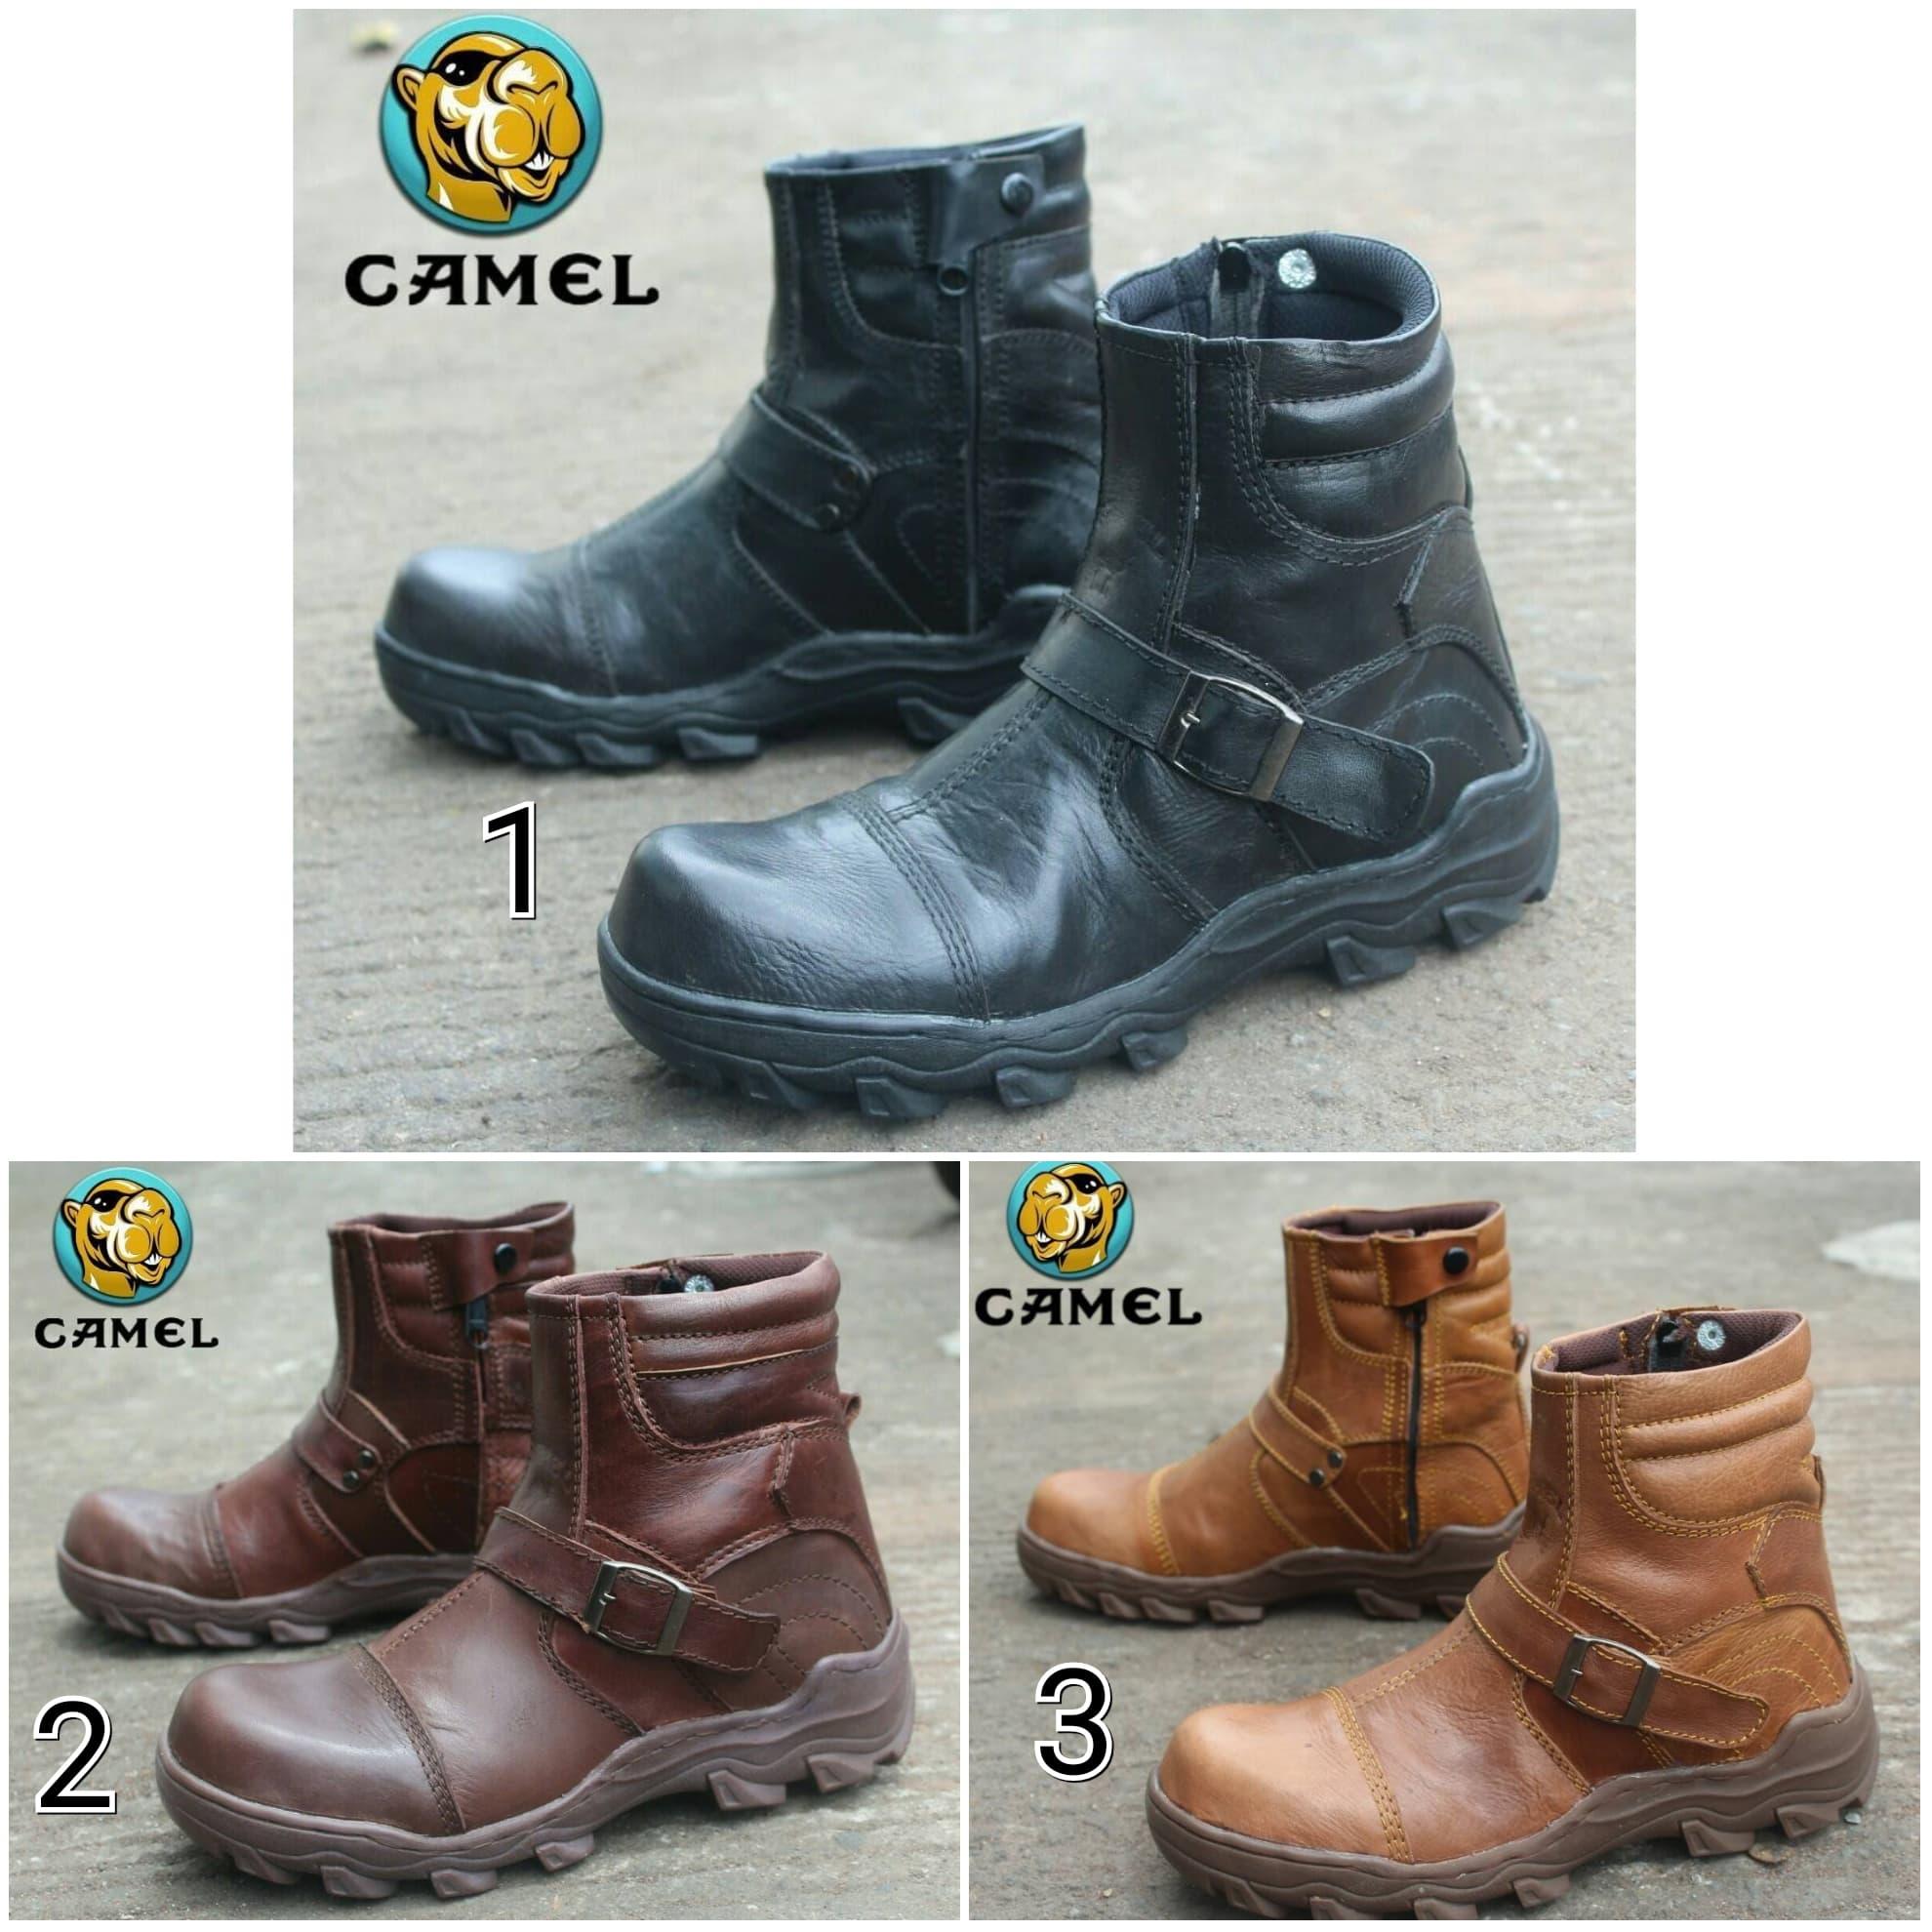 DISKON Sepatu Boots Pria Camel Coboy Safety Ujung Besi Kulit Asli Adventure 7d6820c0db